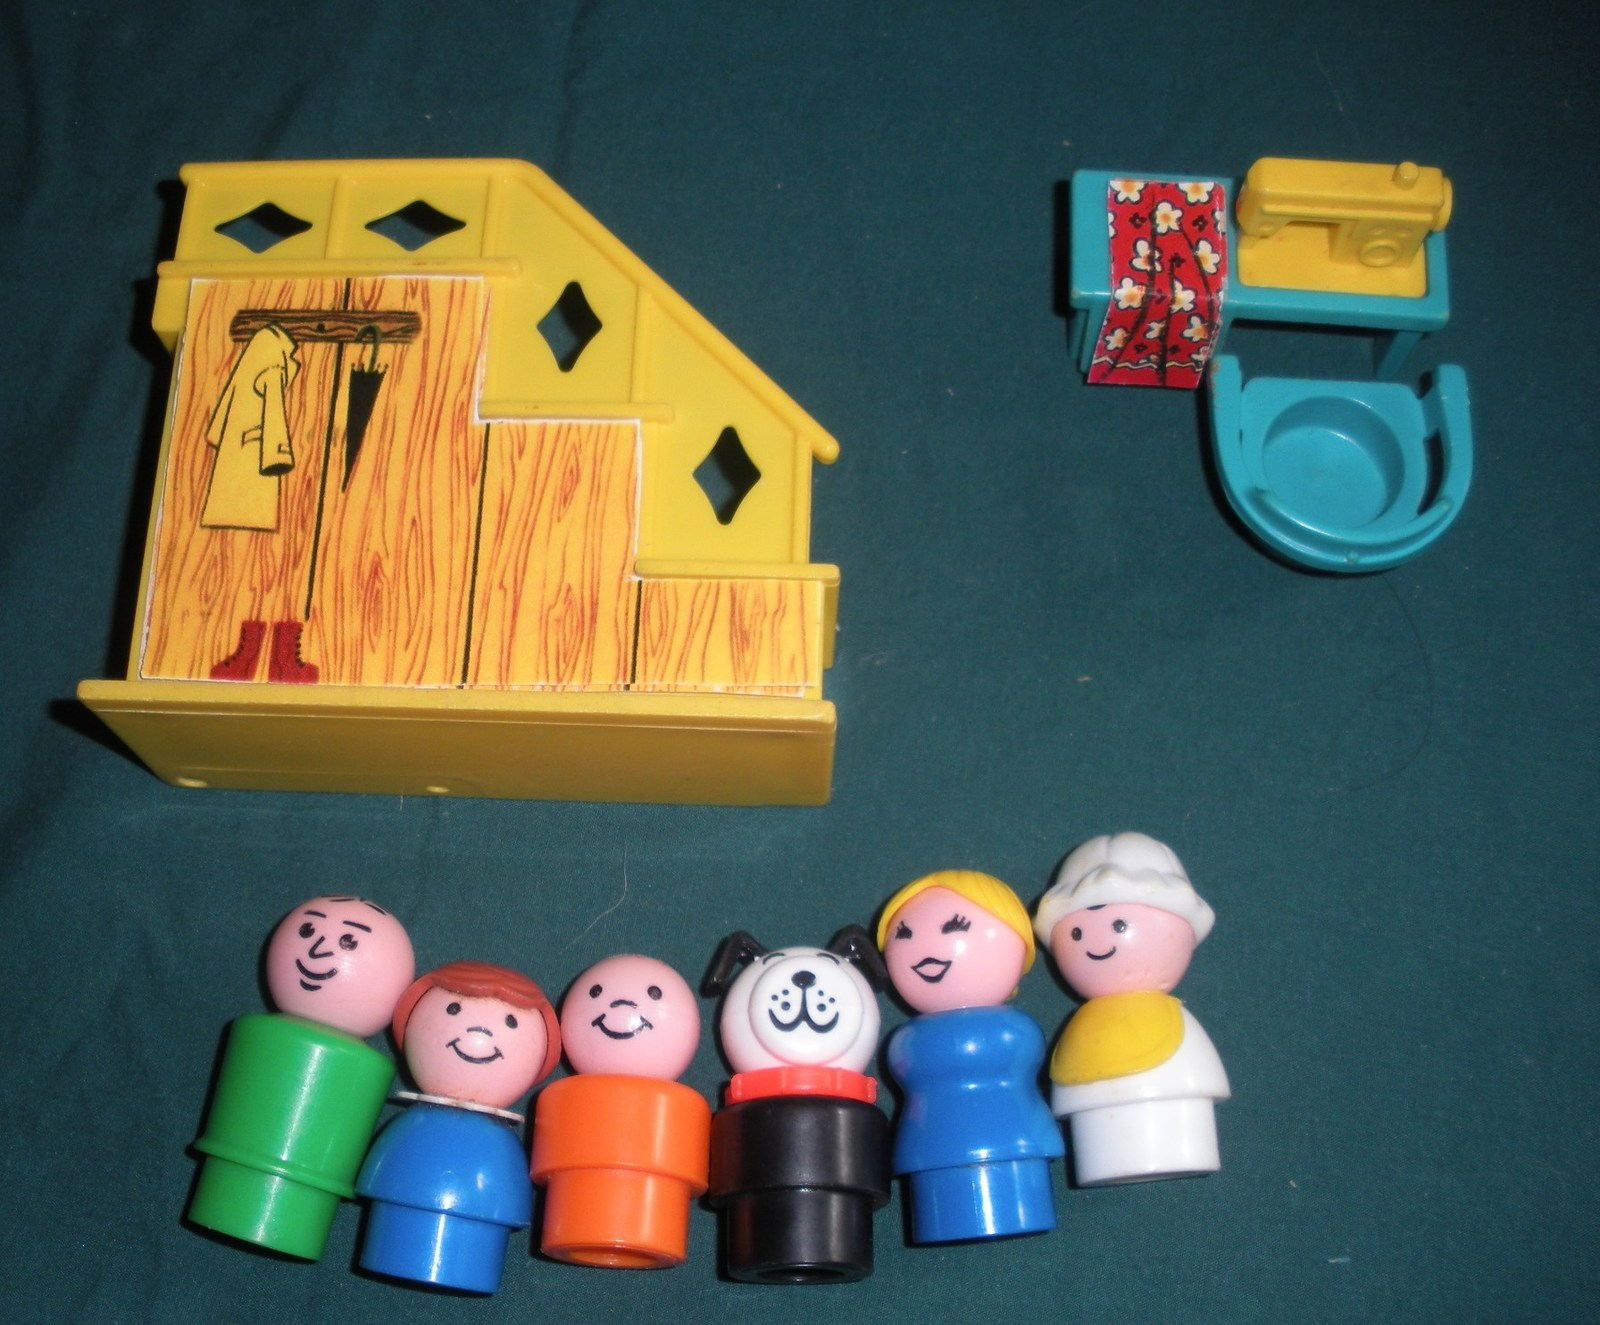 Vtg. Fisher Price Little People #952 Yellow House Comp.+ BONUS/ EXC++-NR MT  (P) image 3